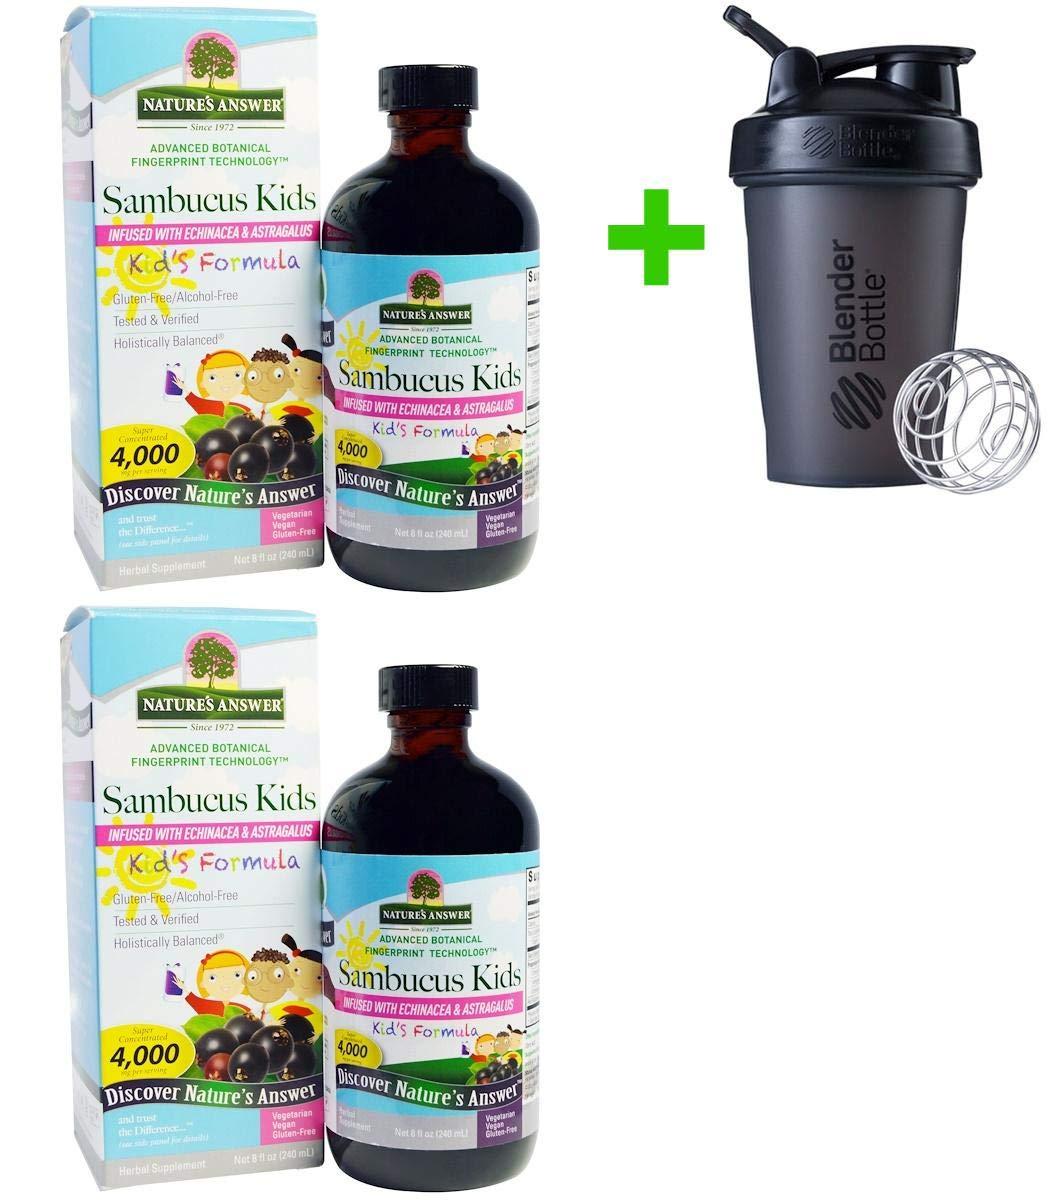 Nature's Answer, Sambucus Kid's Formula, 4,000 mg, 8 fl oz (240 ml))(2 Packs)+ Assorted Sundesa, BlenderBottle, Classic with Loop, 20 oz